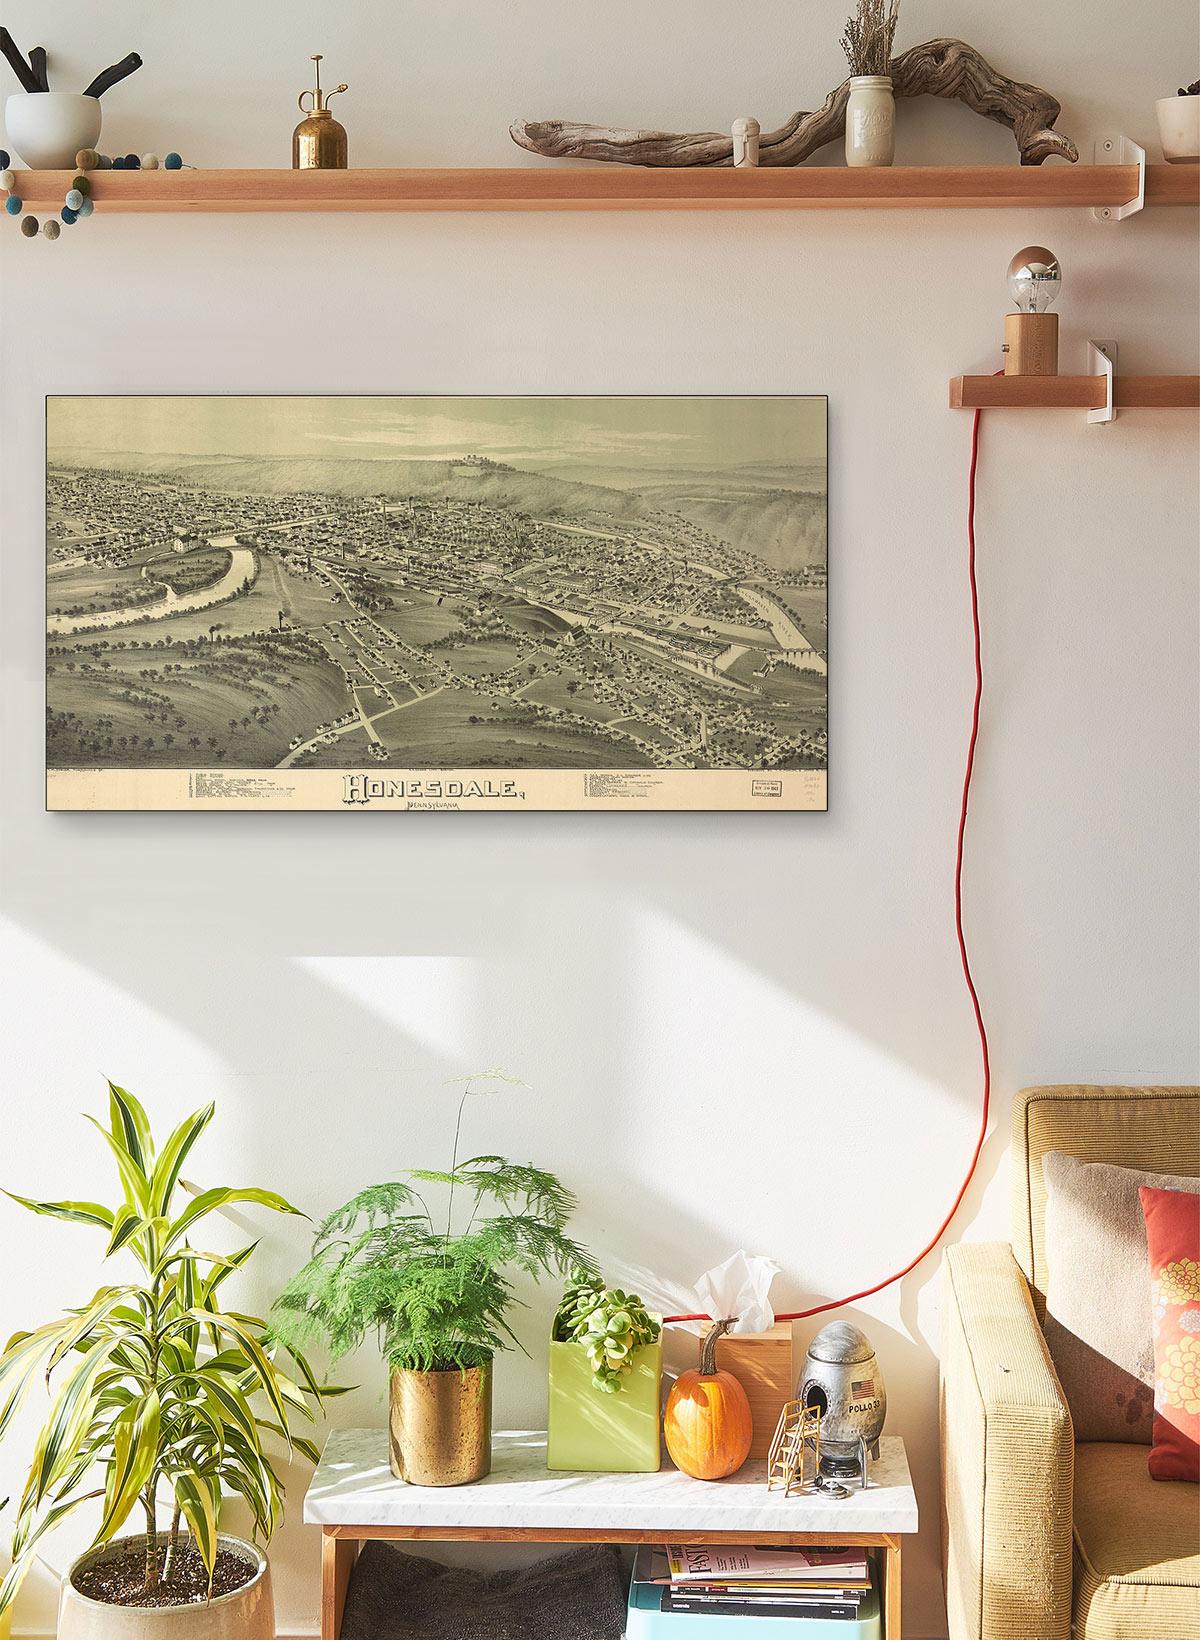 Honesdale Pennsylvania 1890 LARGE Vintage Map